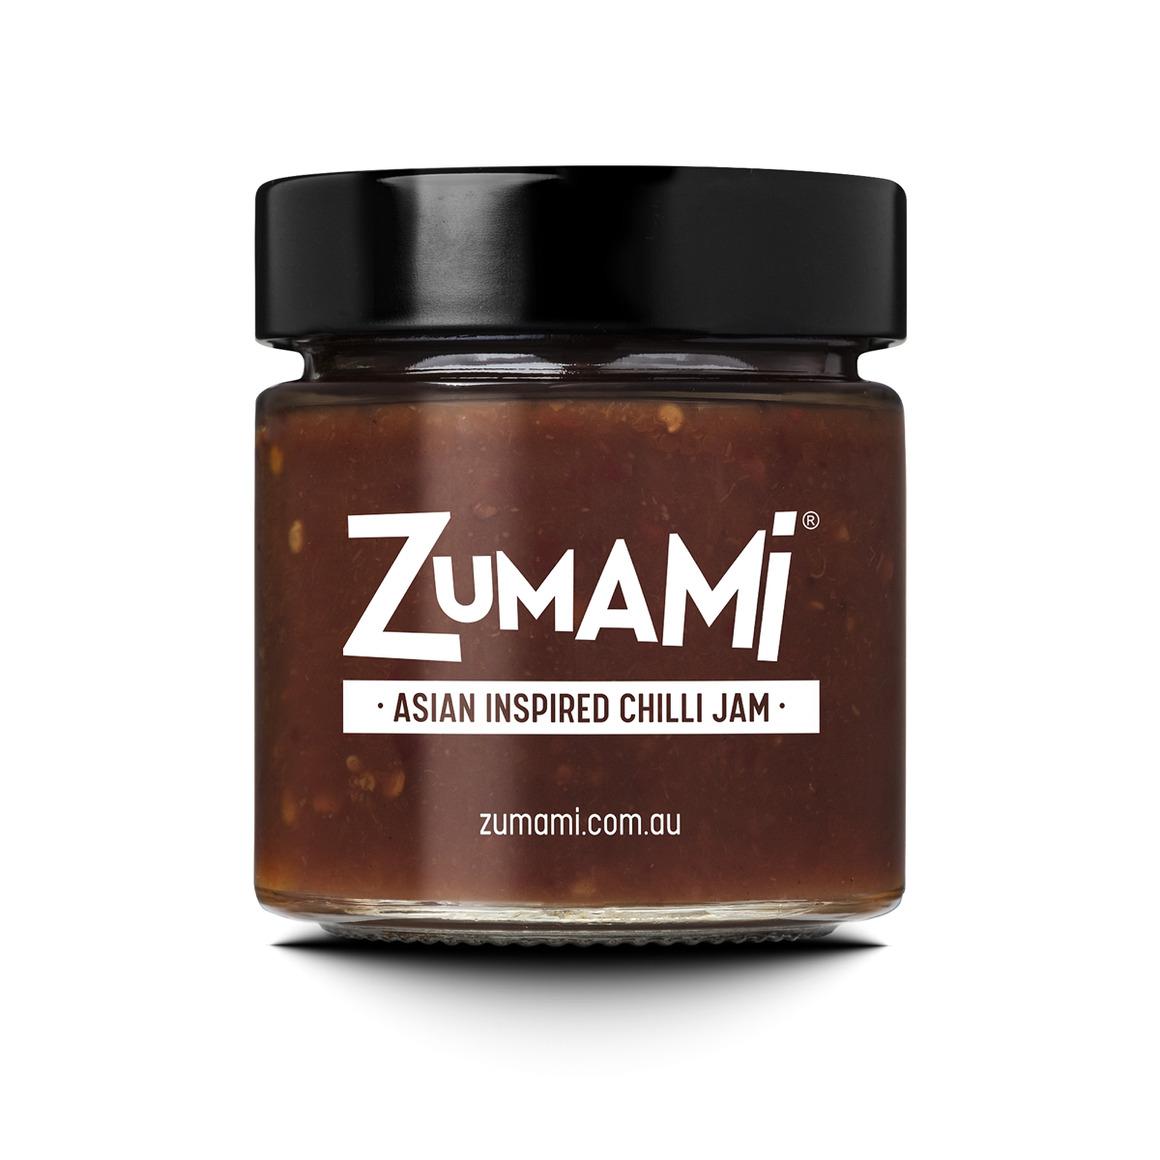 ZUMAMI - Asian Inspired Chilli Jam - Silver & Bronze medal winner 2019 275g | Trada Marketplace